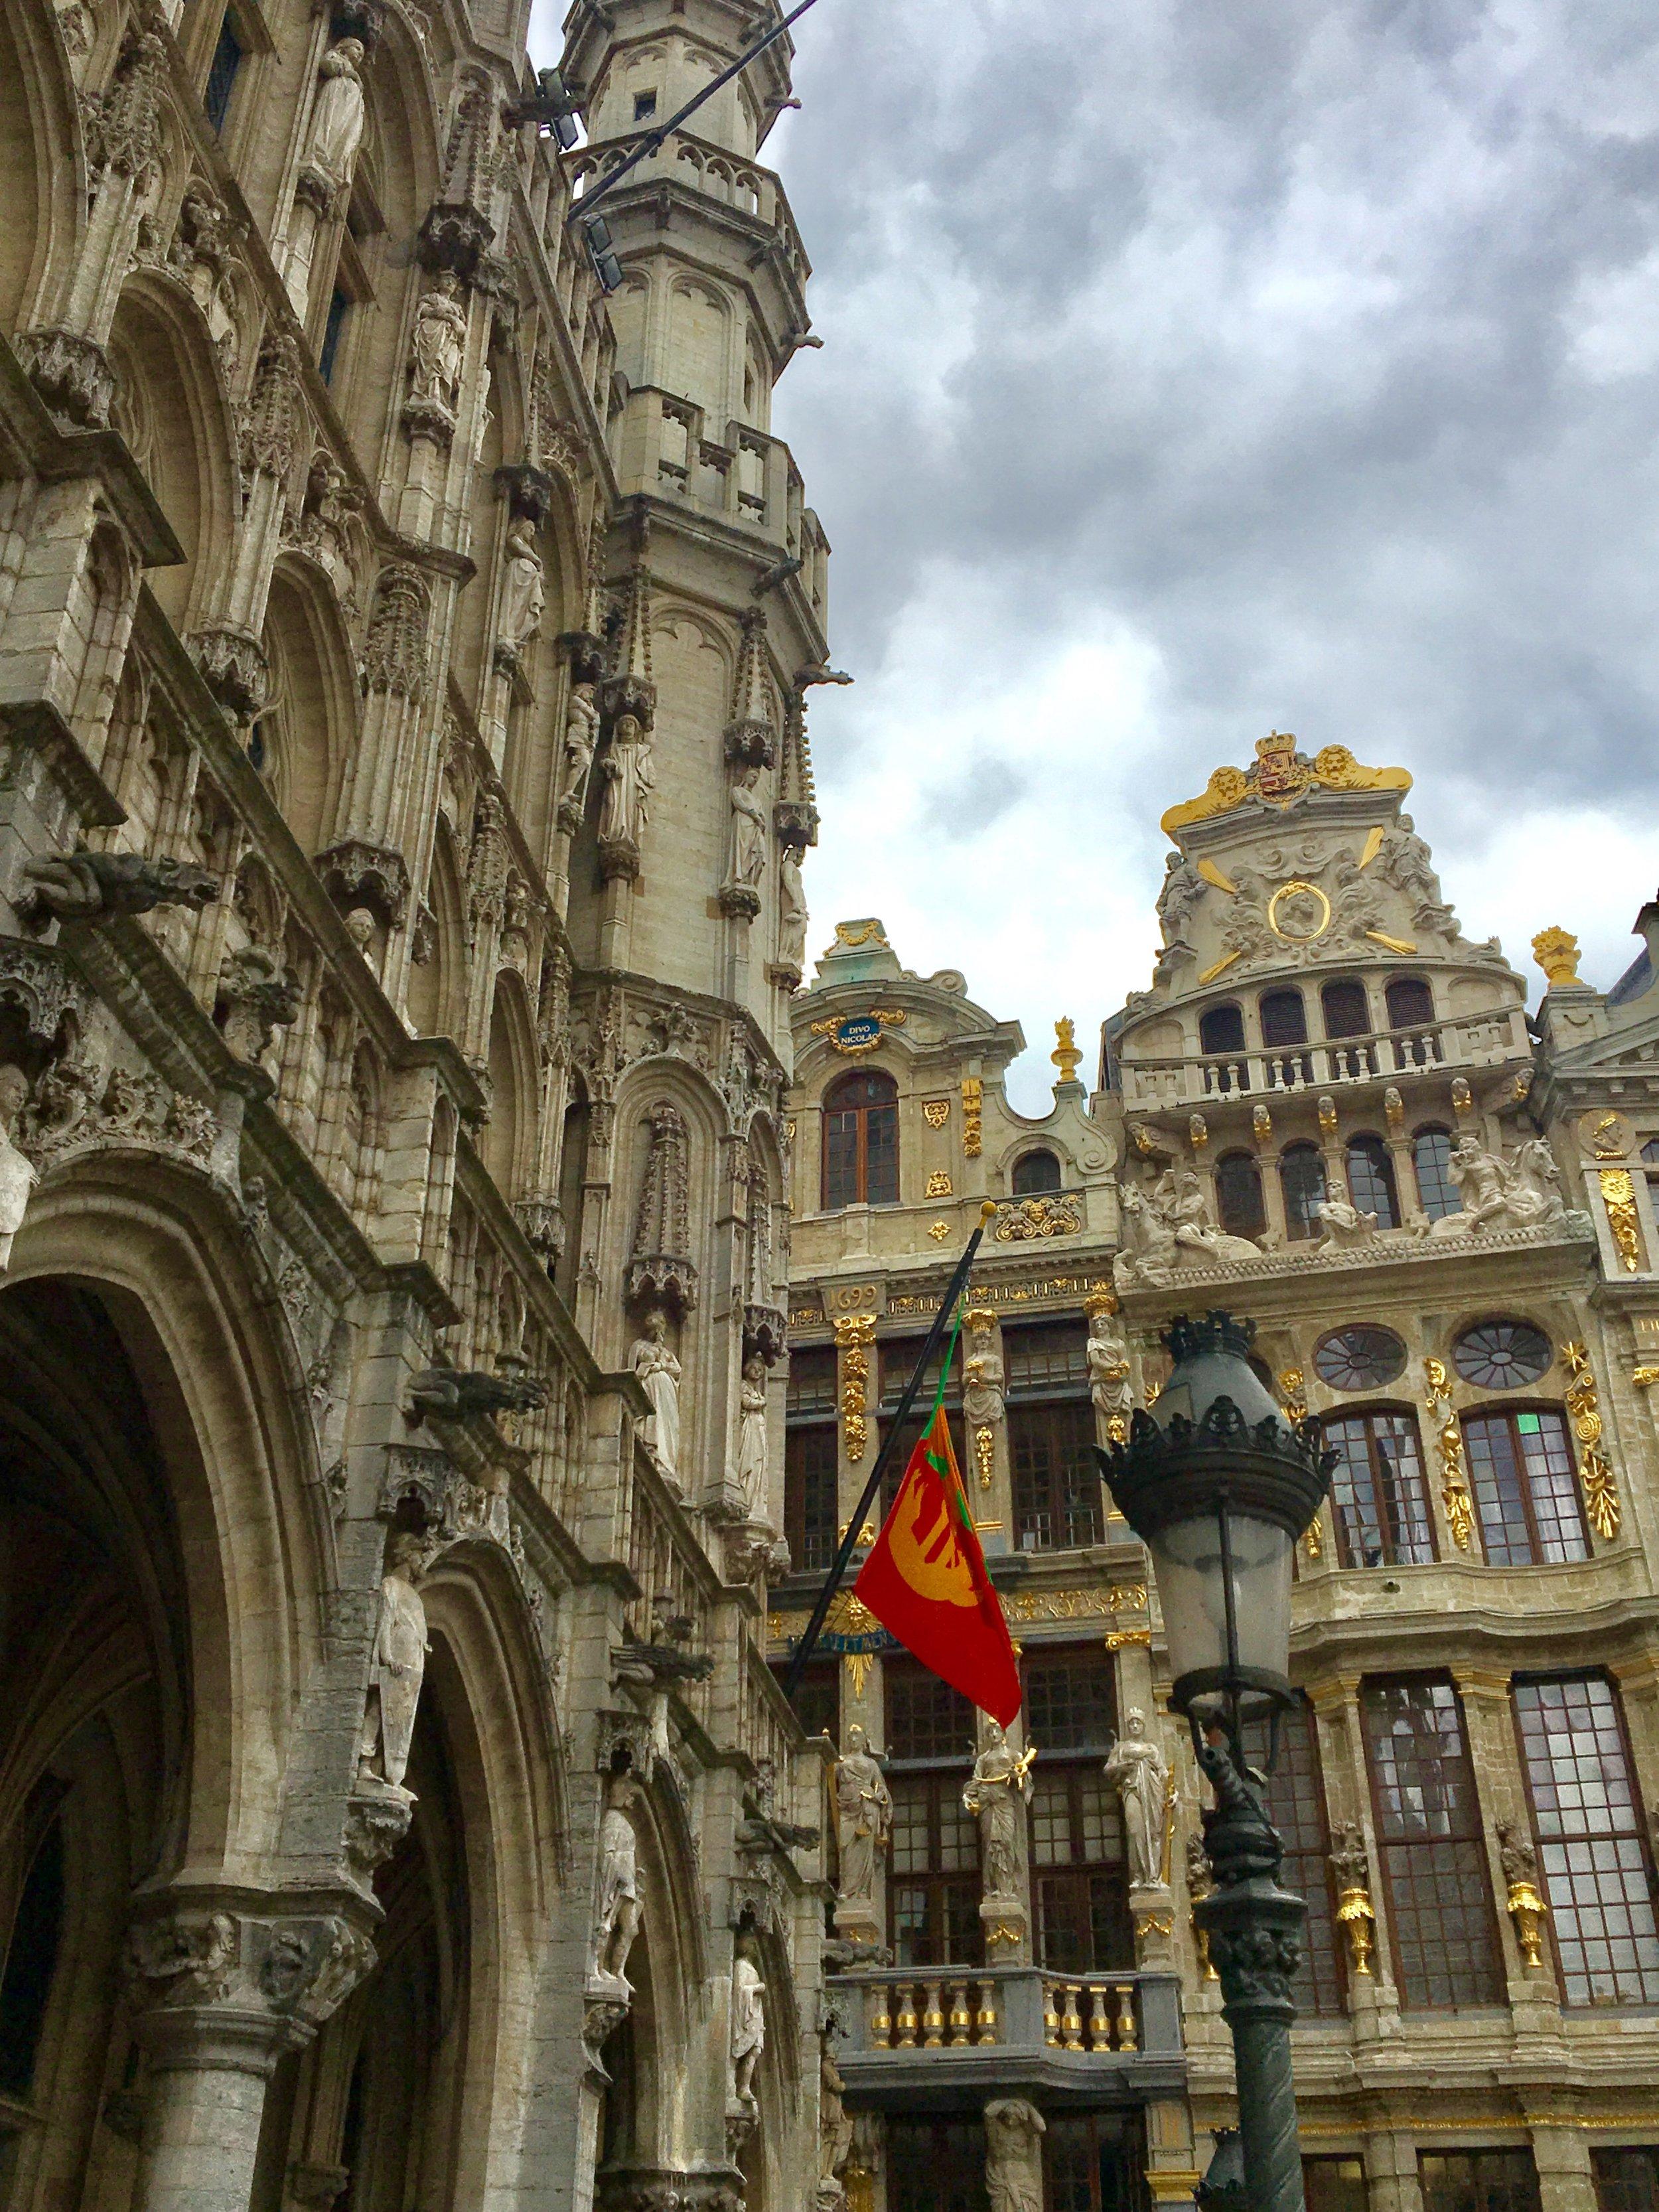 Ornate Buildings Surround Grote Markt